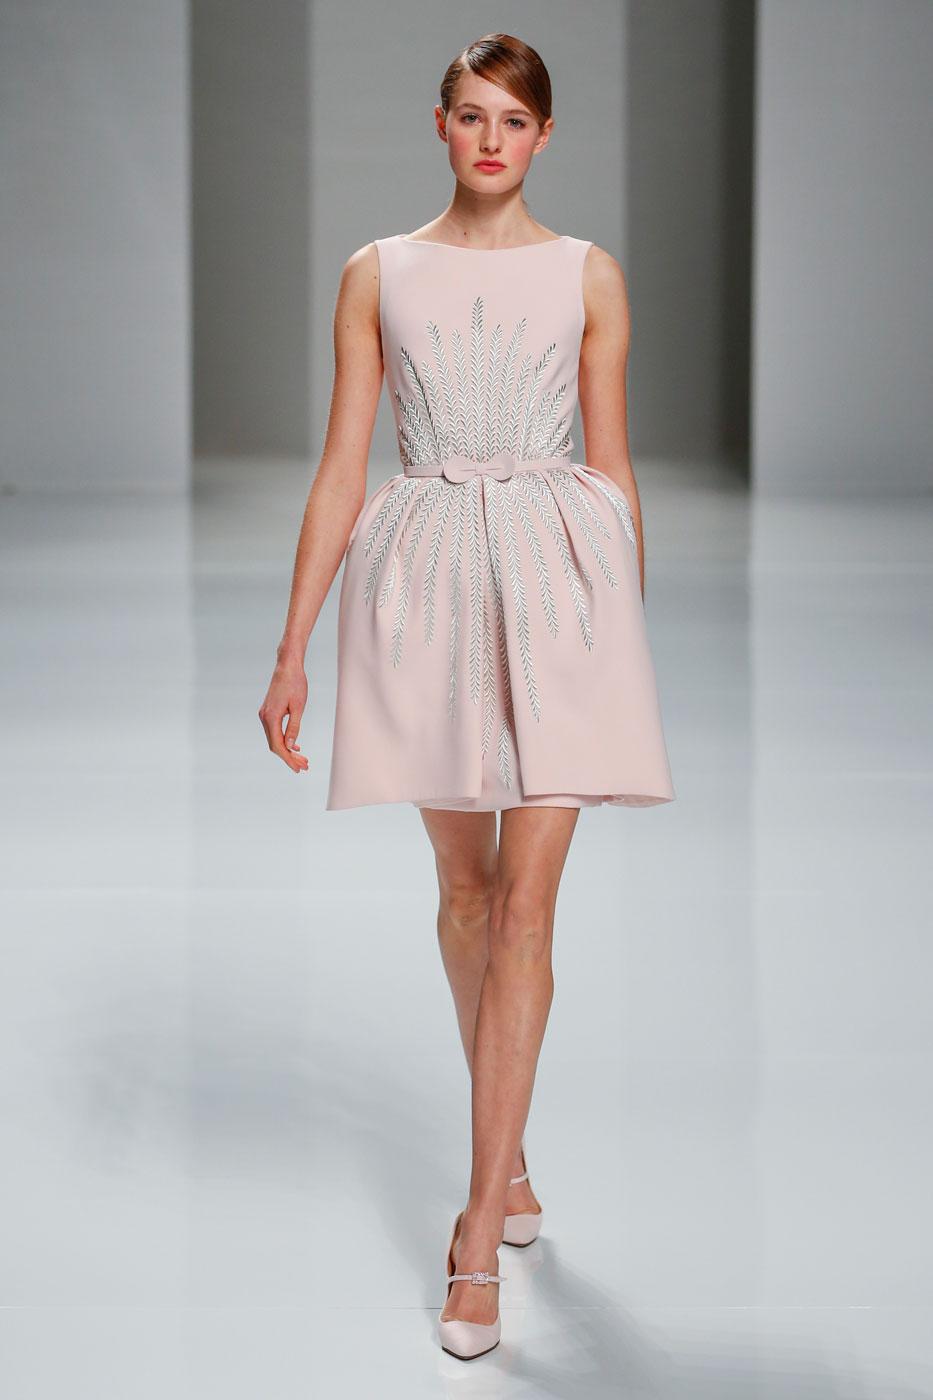 Georges-Hobeika-fashion-runway-show-haute-couture-paris-spring-2015-the-impression-01